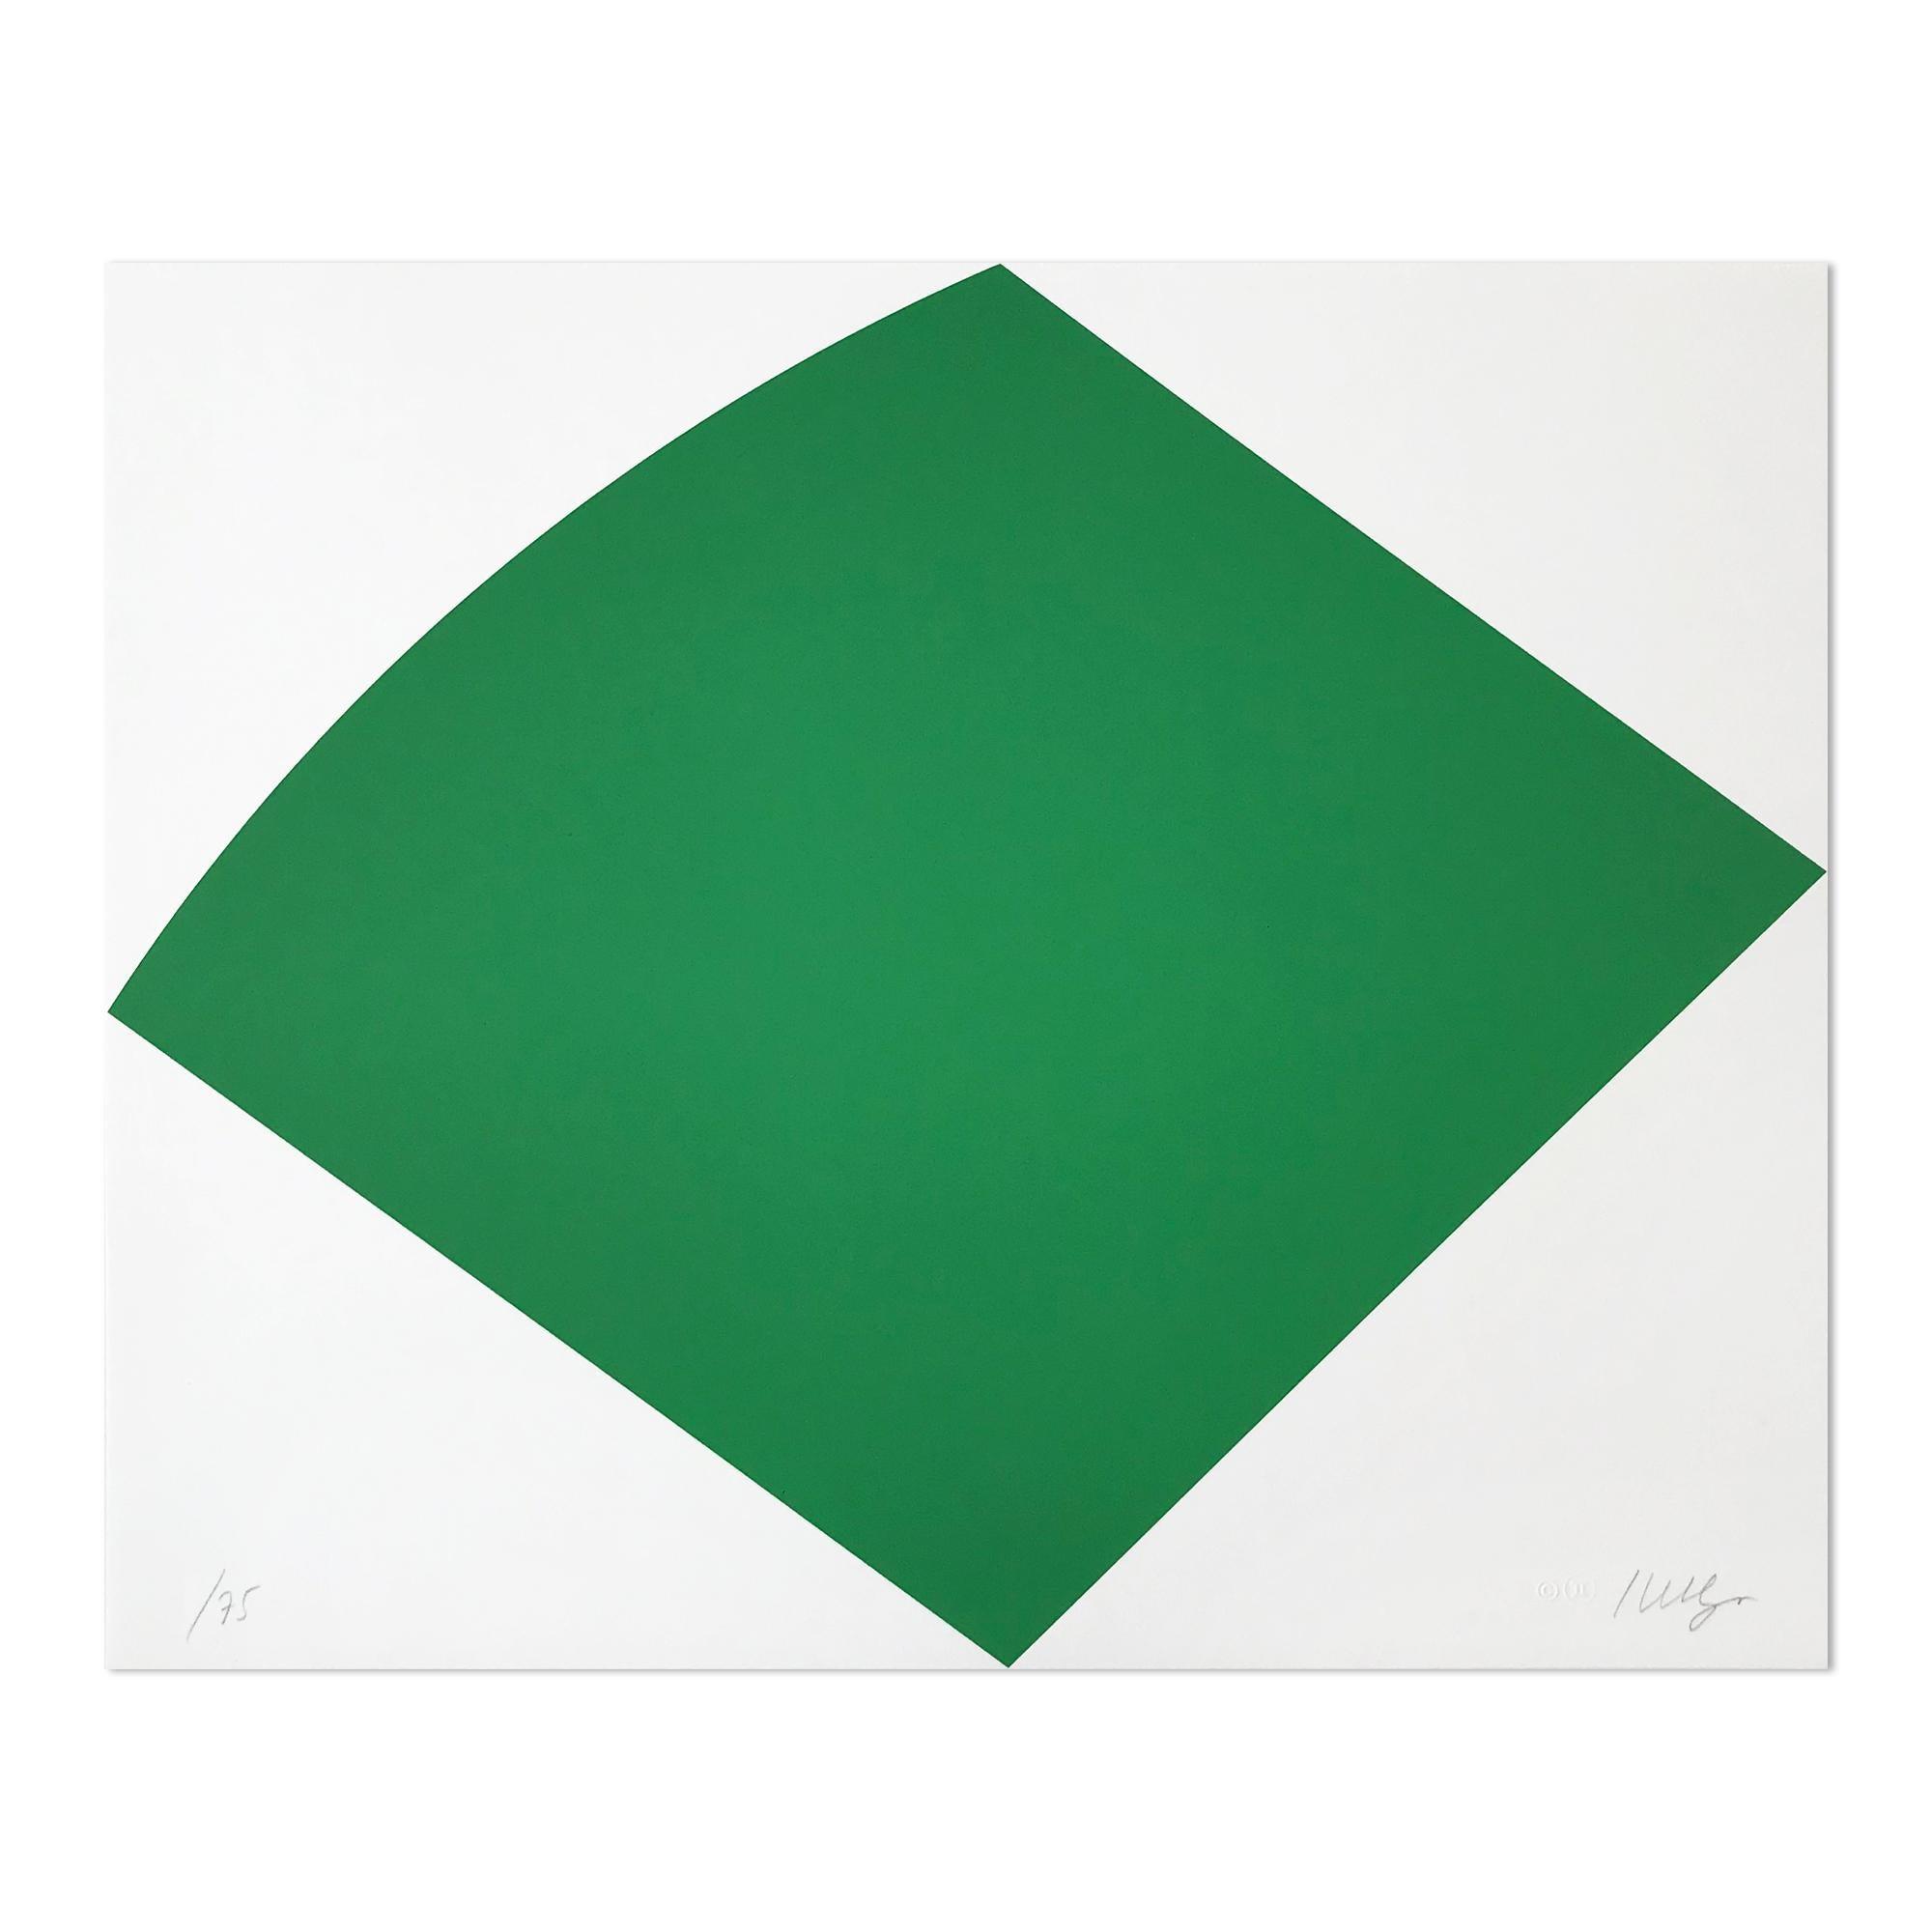 Green Curve, Abstract Artist, Geometric Abstraction, Hard-Edge, Minimalism